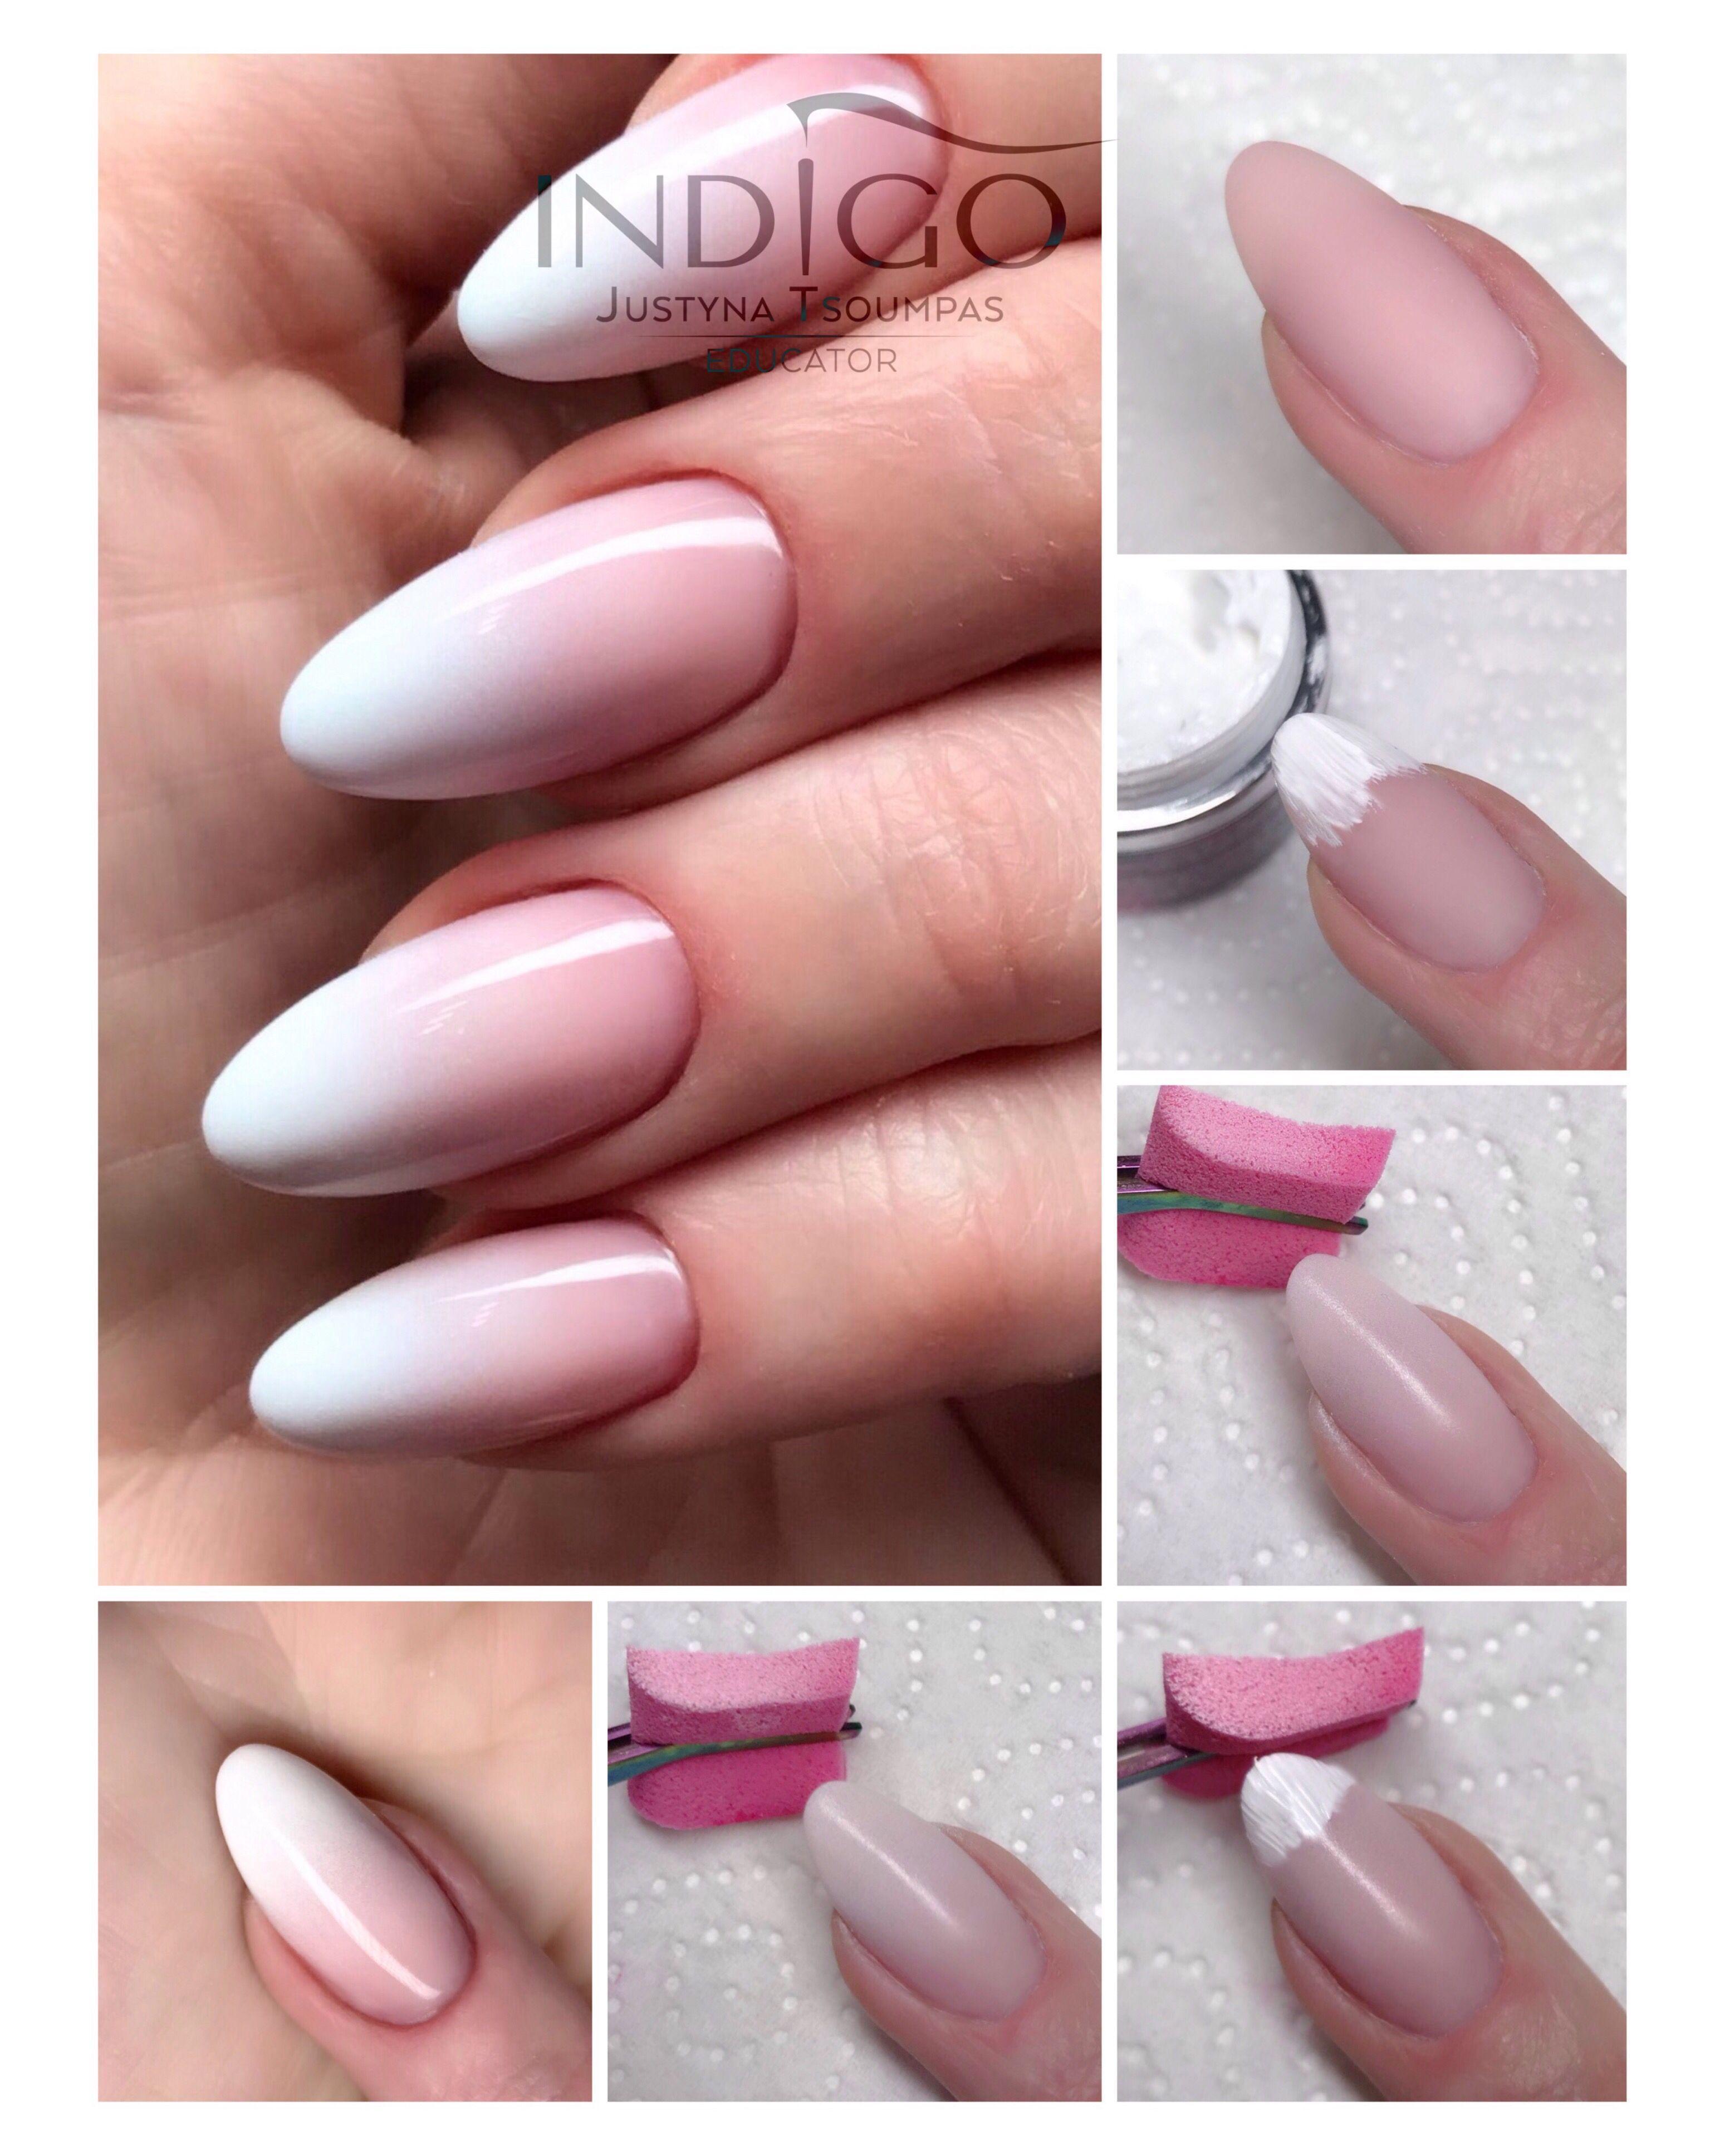 Babyboomer On Top With Nail Art Gel White Indigo Nails Lab Baden Baden Shortgelnails In 2020 Indigo Nails Nail Lab Ombre Gel Nails